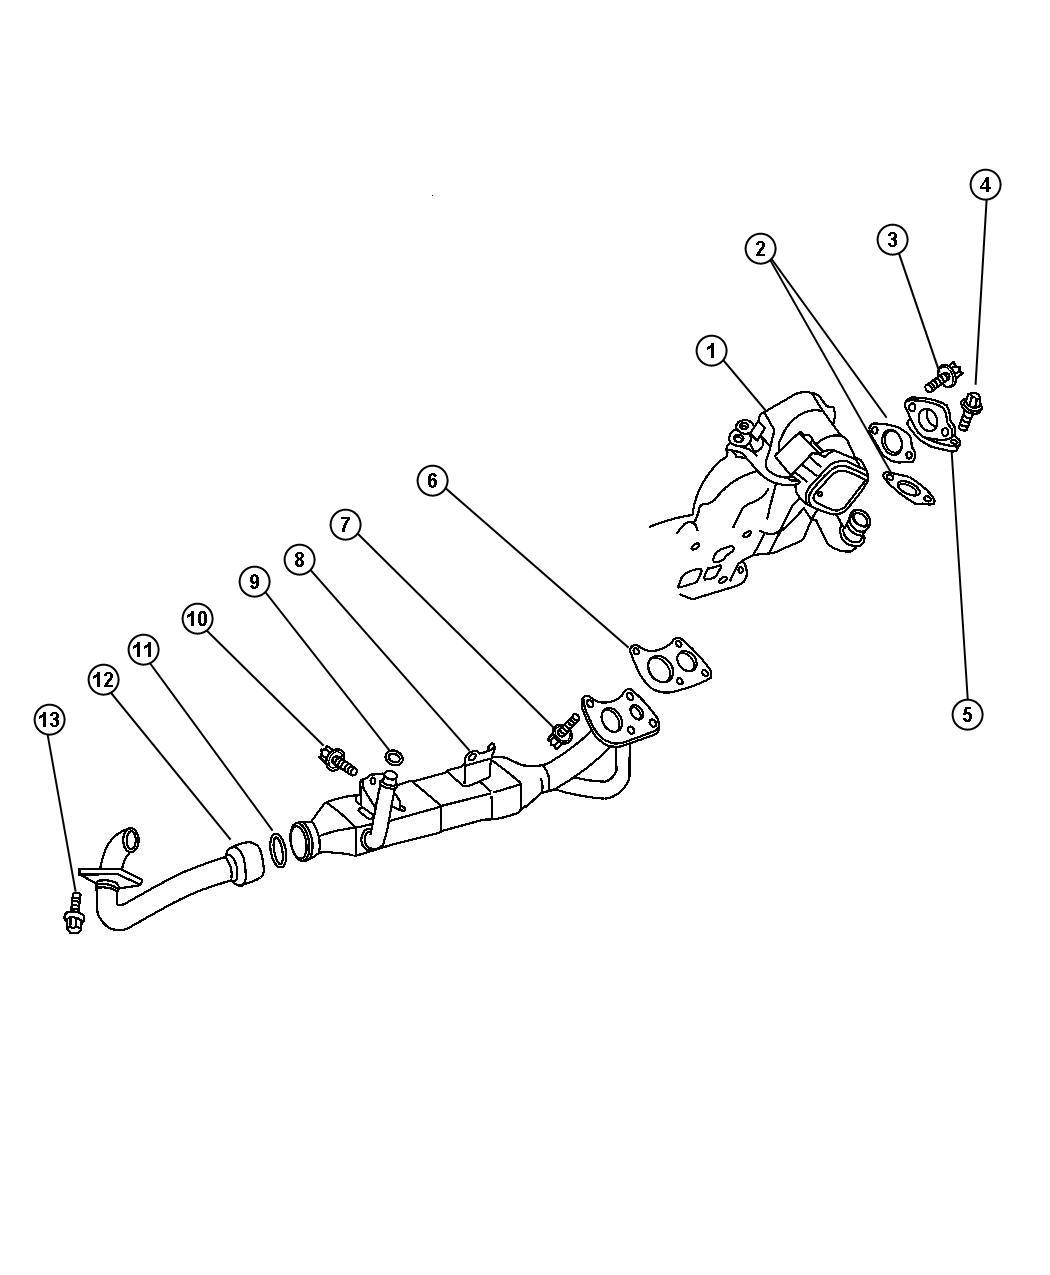 02 vada Wiring Diagram - Wiring Diagrams  Trailblazer Overhead Console Wiring Diagram on